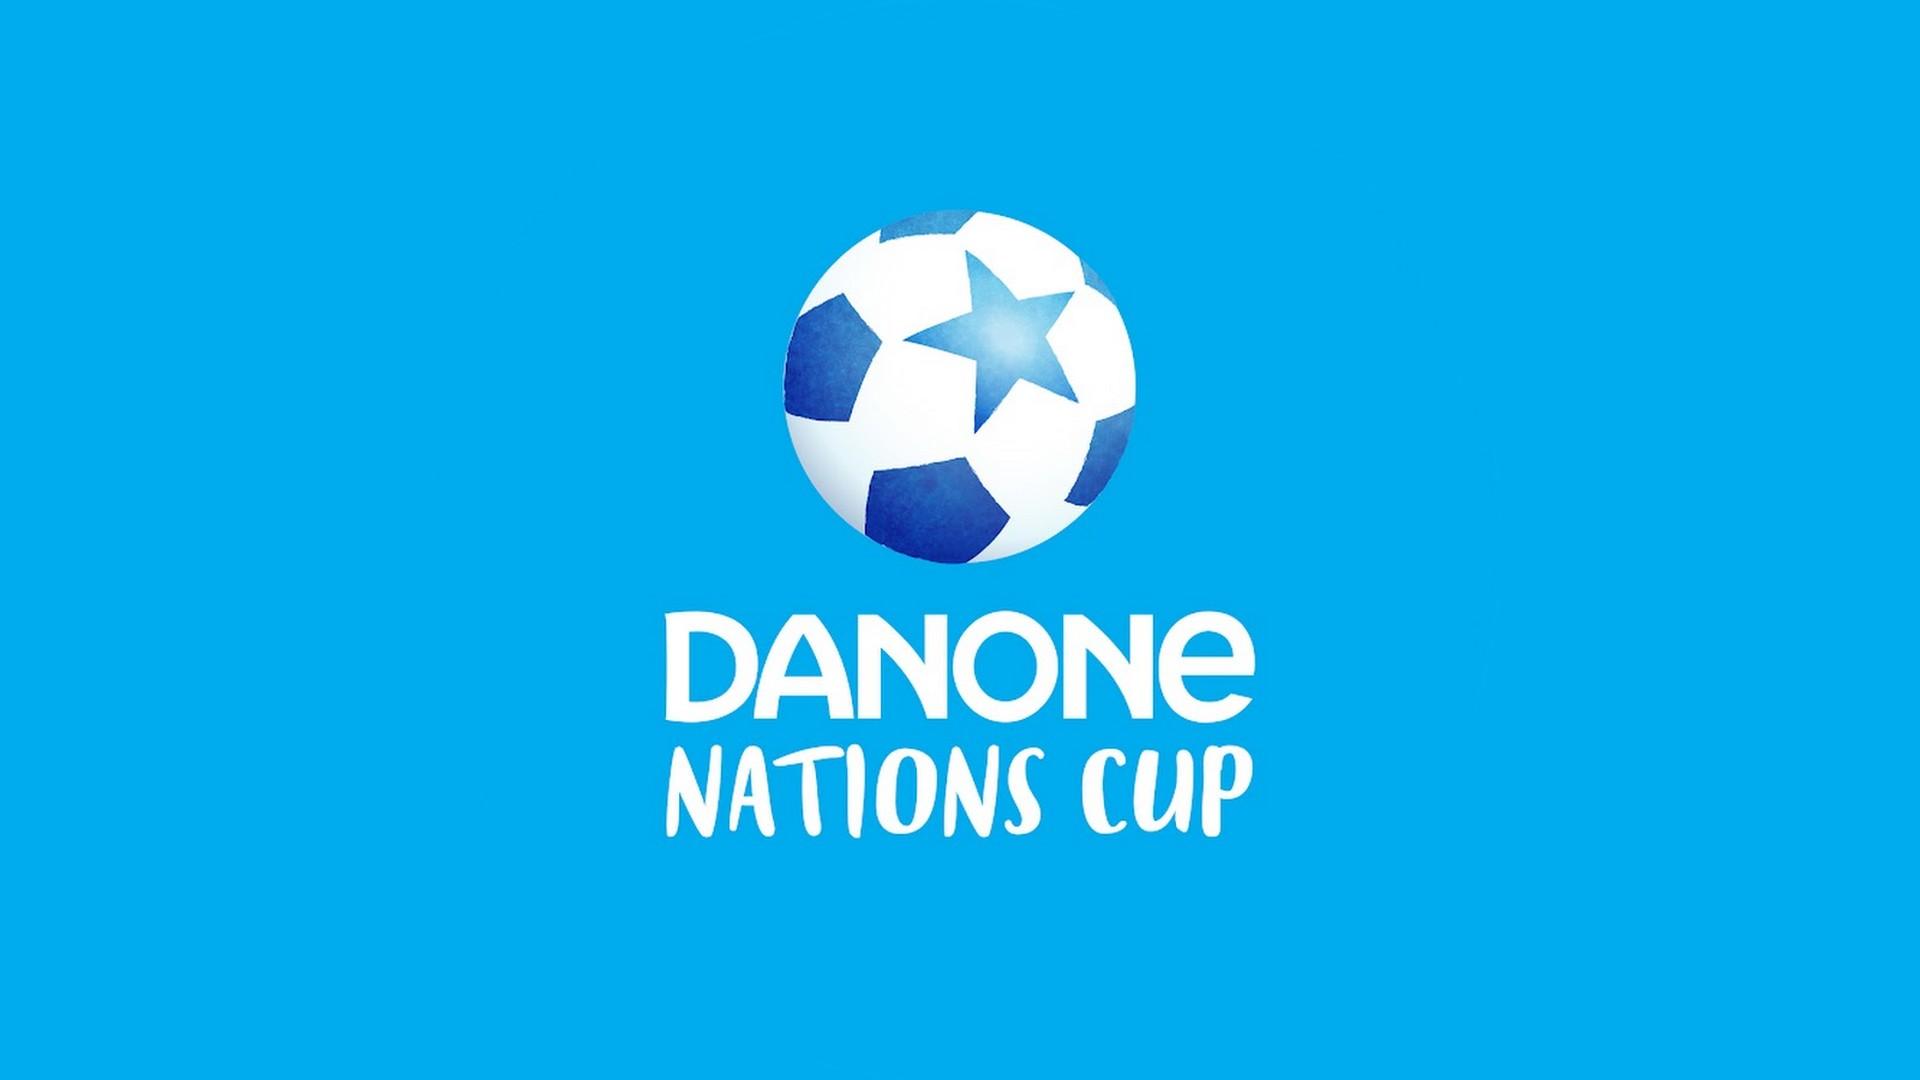 Danone x Danone Nations Cup (football) 2021